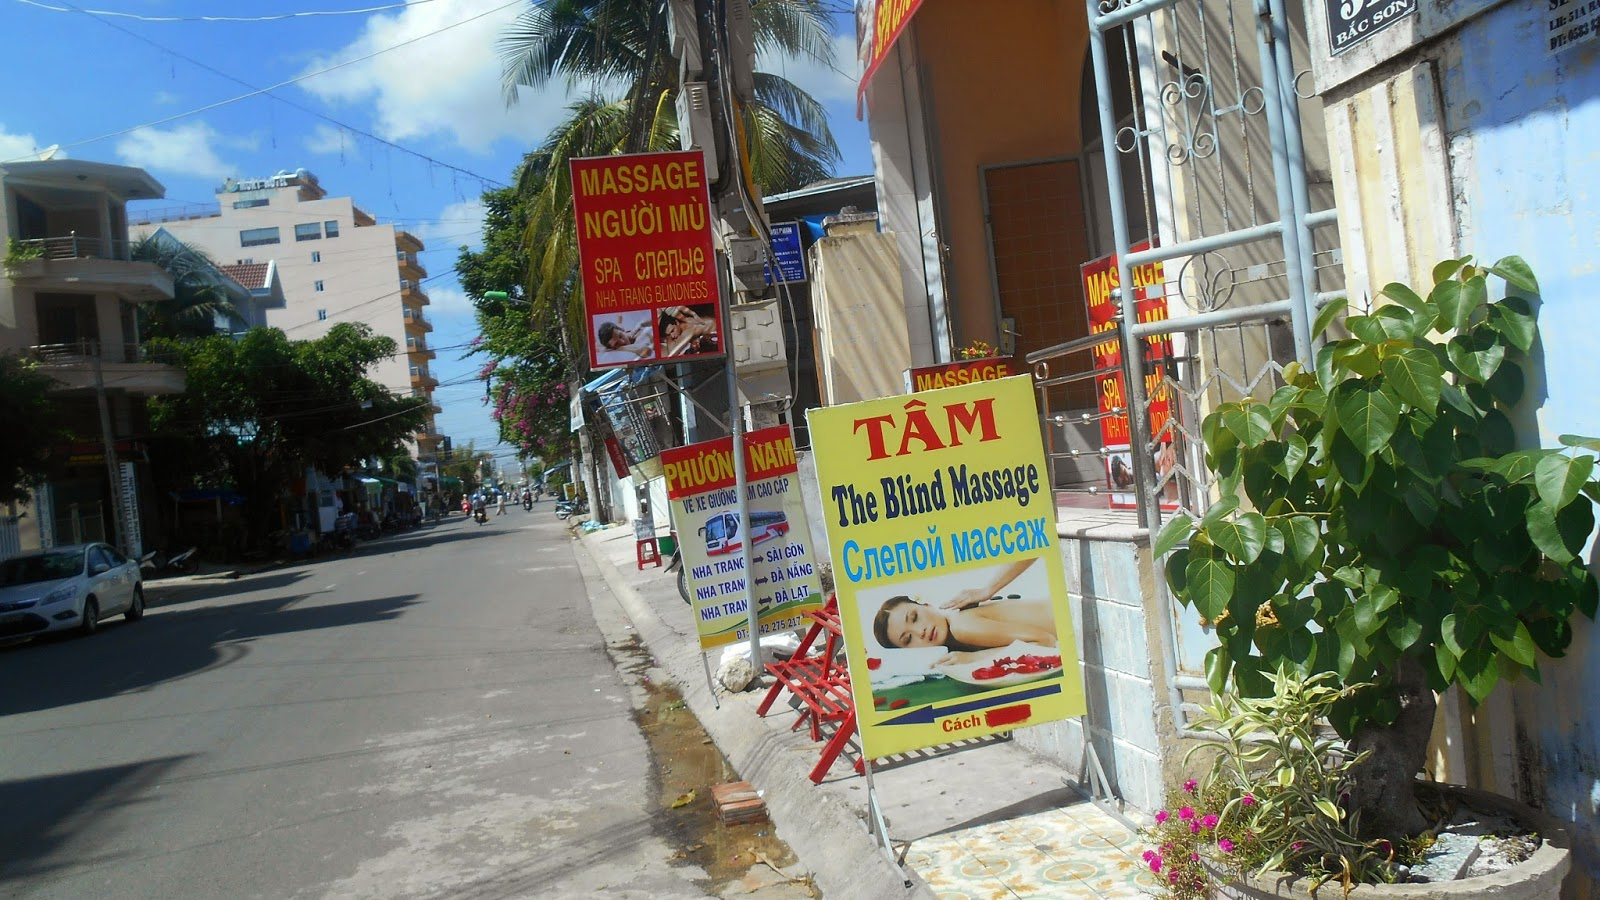 улица с массажными салонами